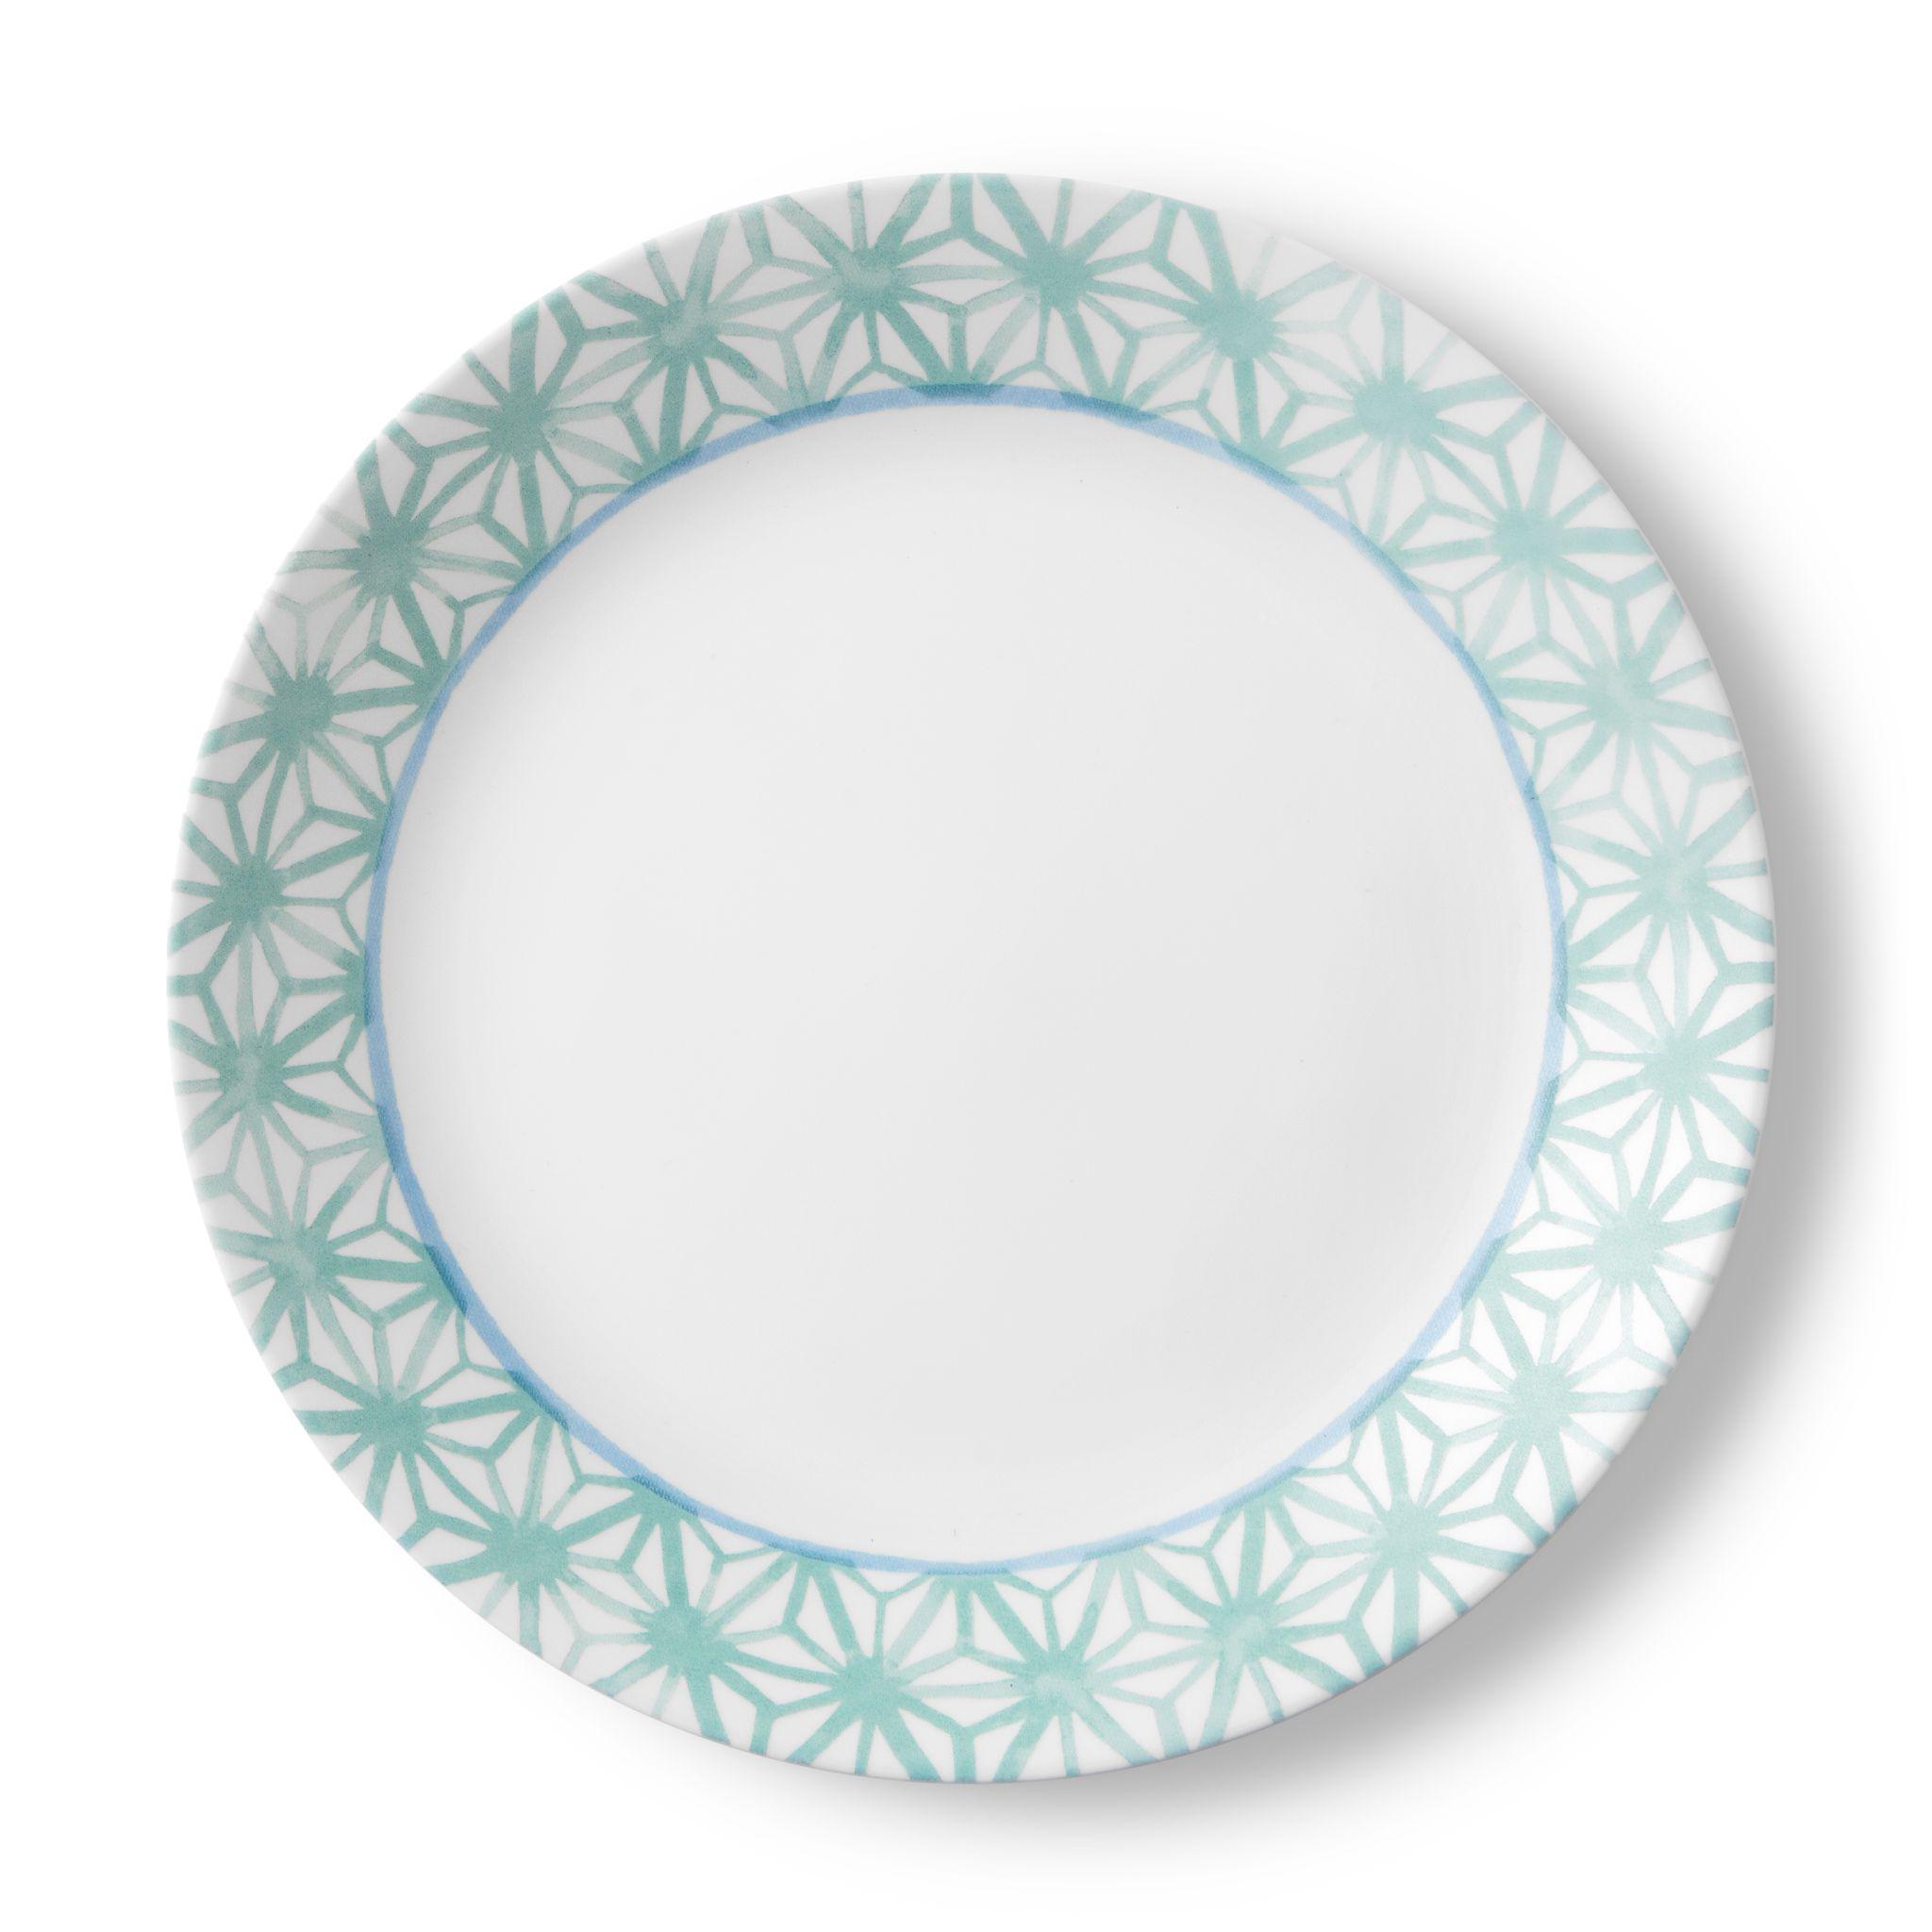 Corelle Amalfi Verde 10.25? Dinner Plate